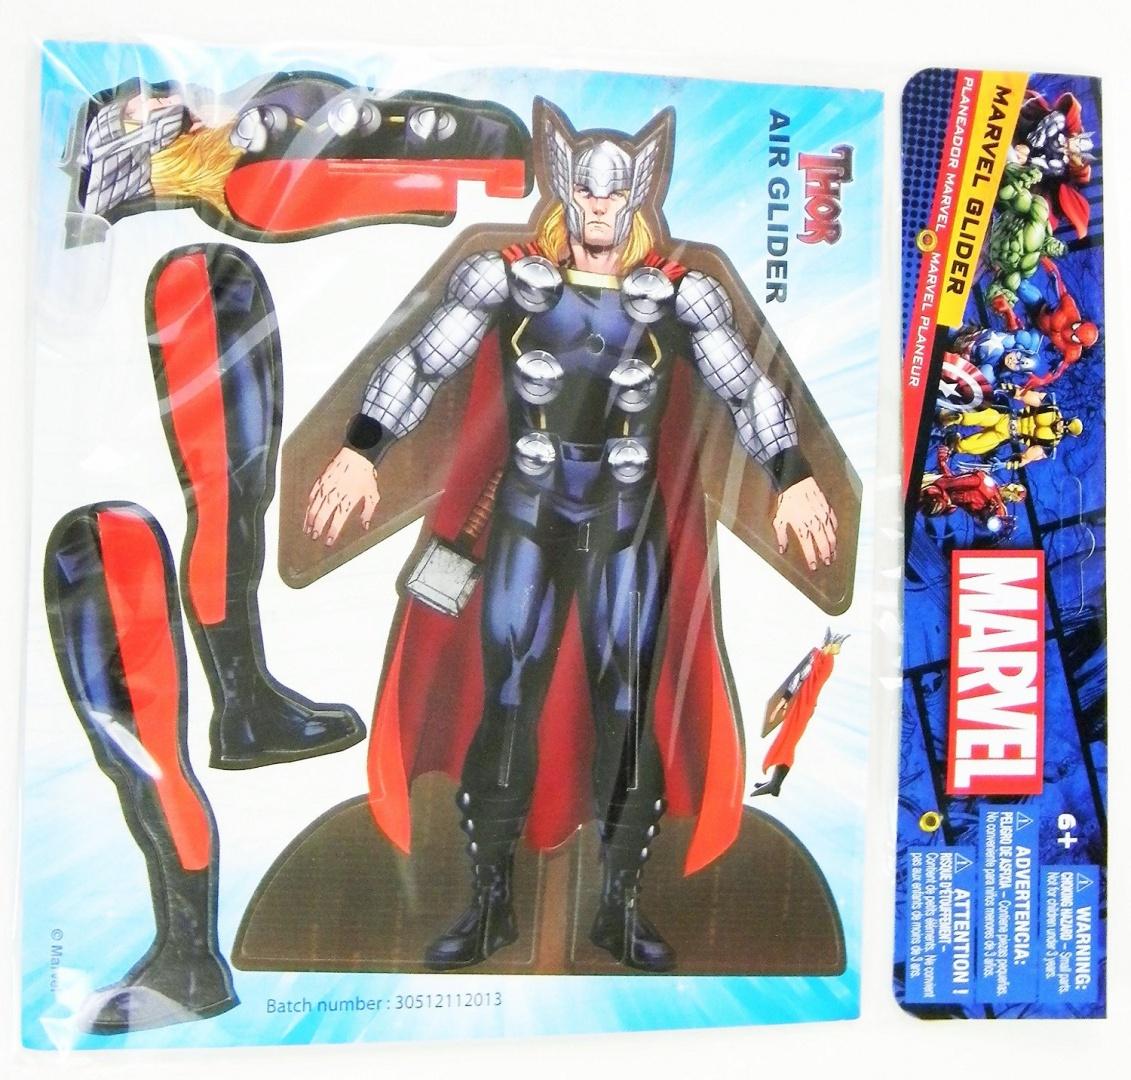 Marvel Avengers Thor Foam Air Glider | PrestoMall - Action Figures